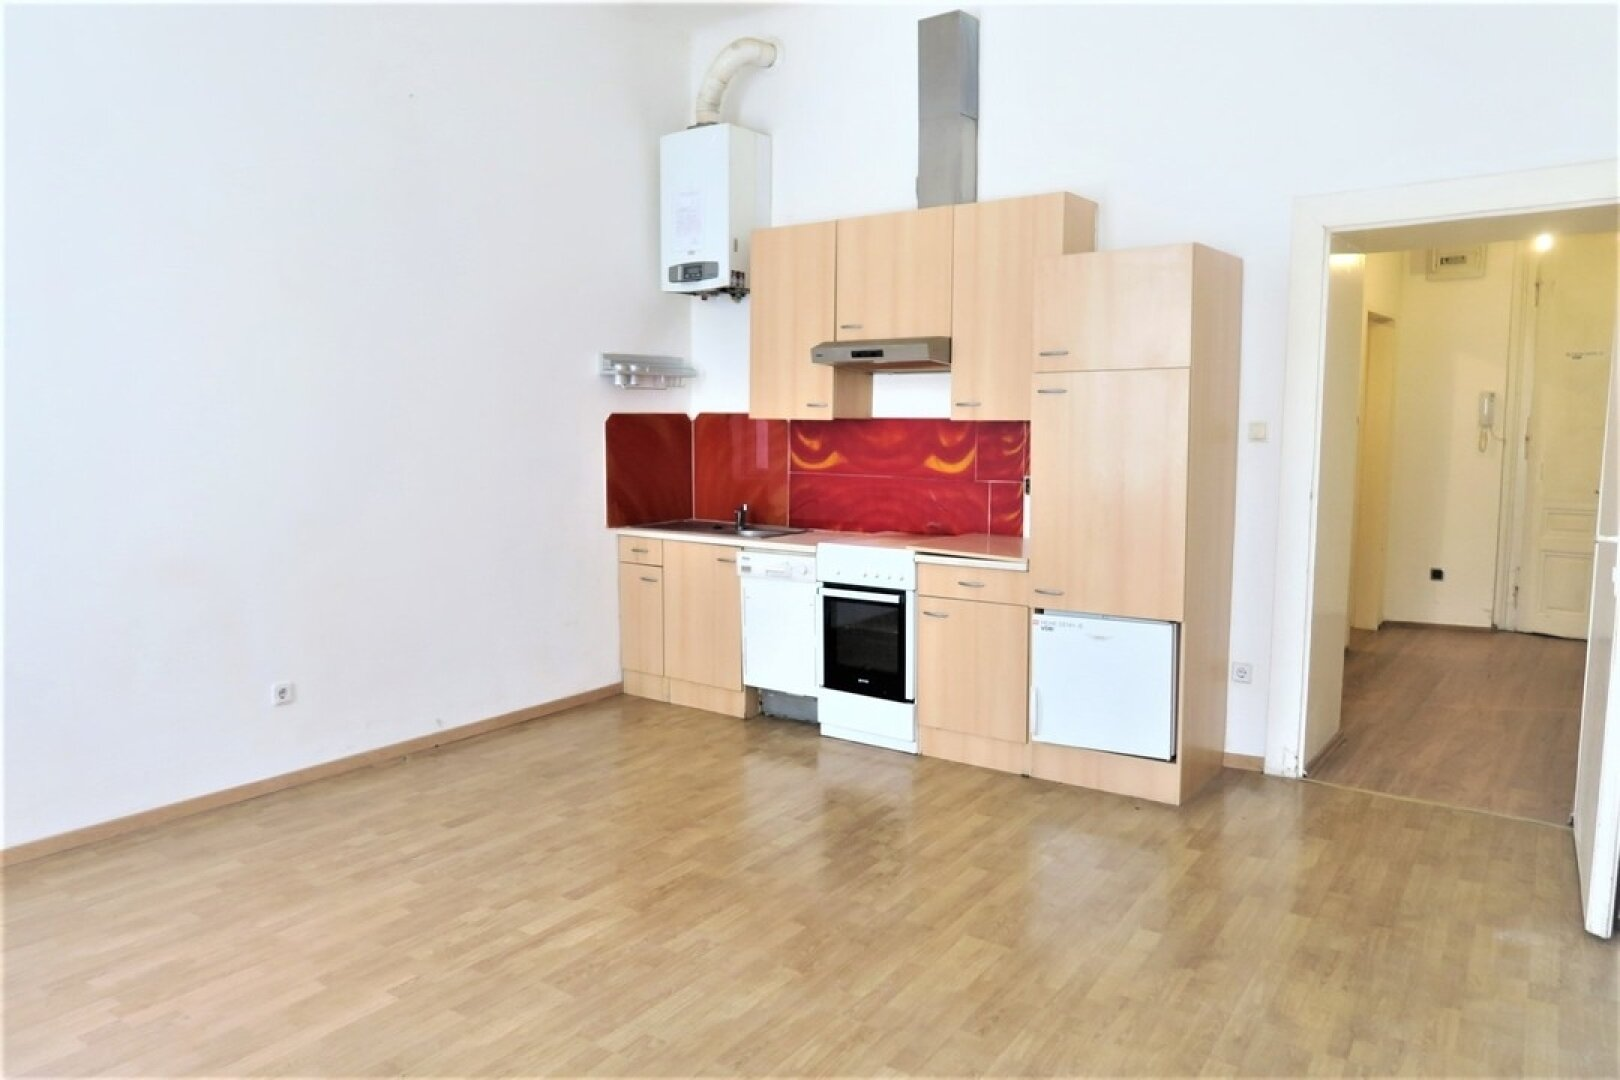 kl. Wohnküche